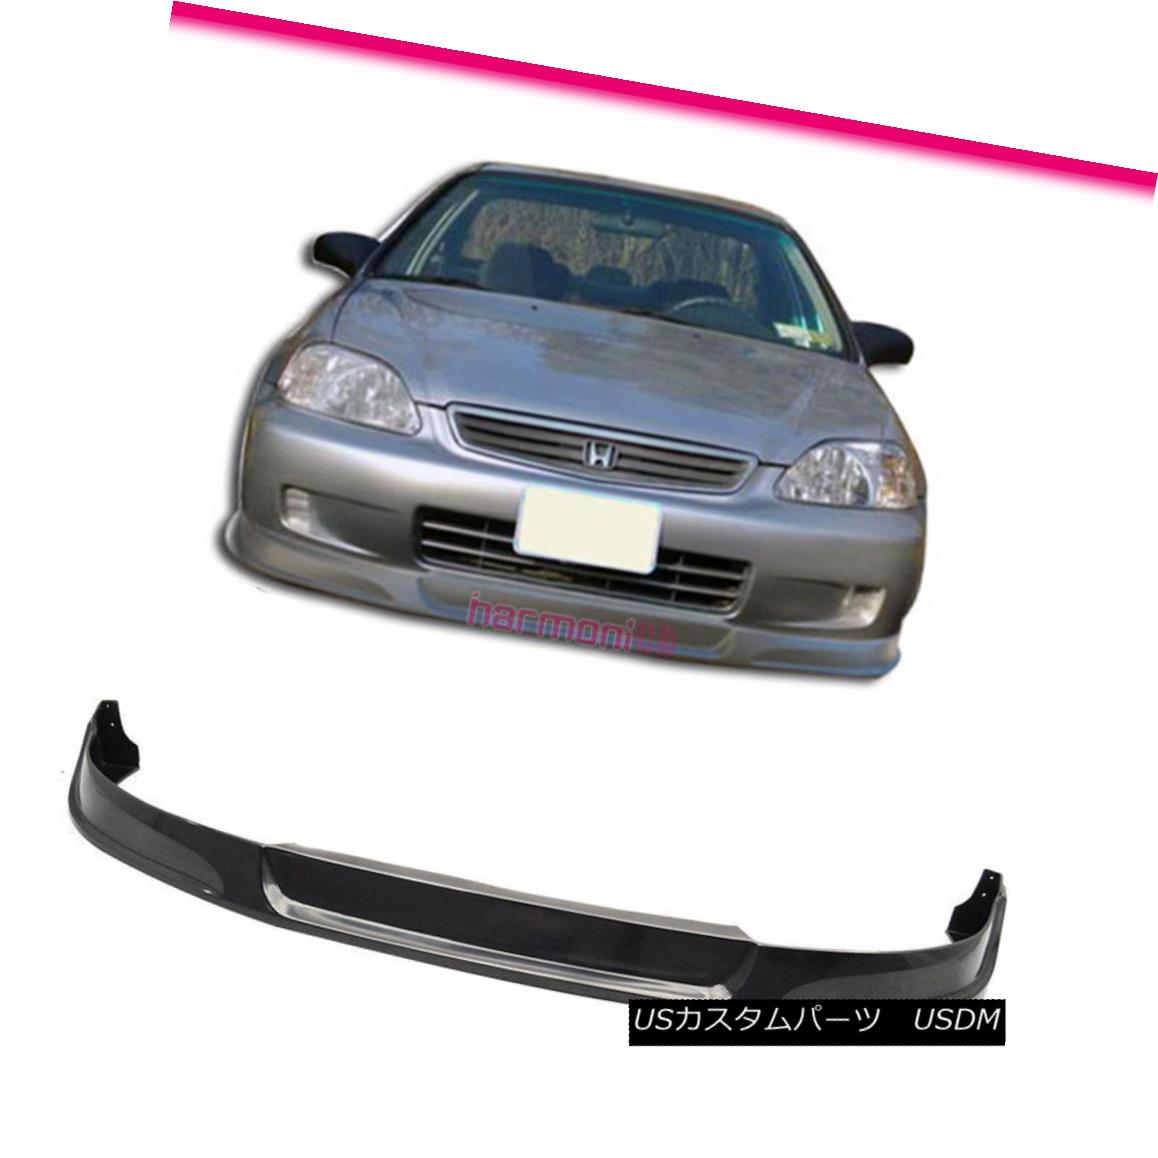 Fits 92-95 Honda Civic 4DR Sedan PU Polyurethane Mugen Front Bumper Chin Lip